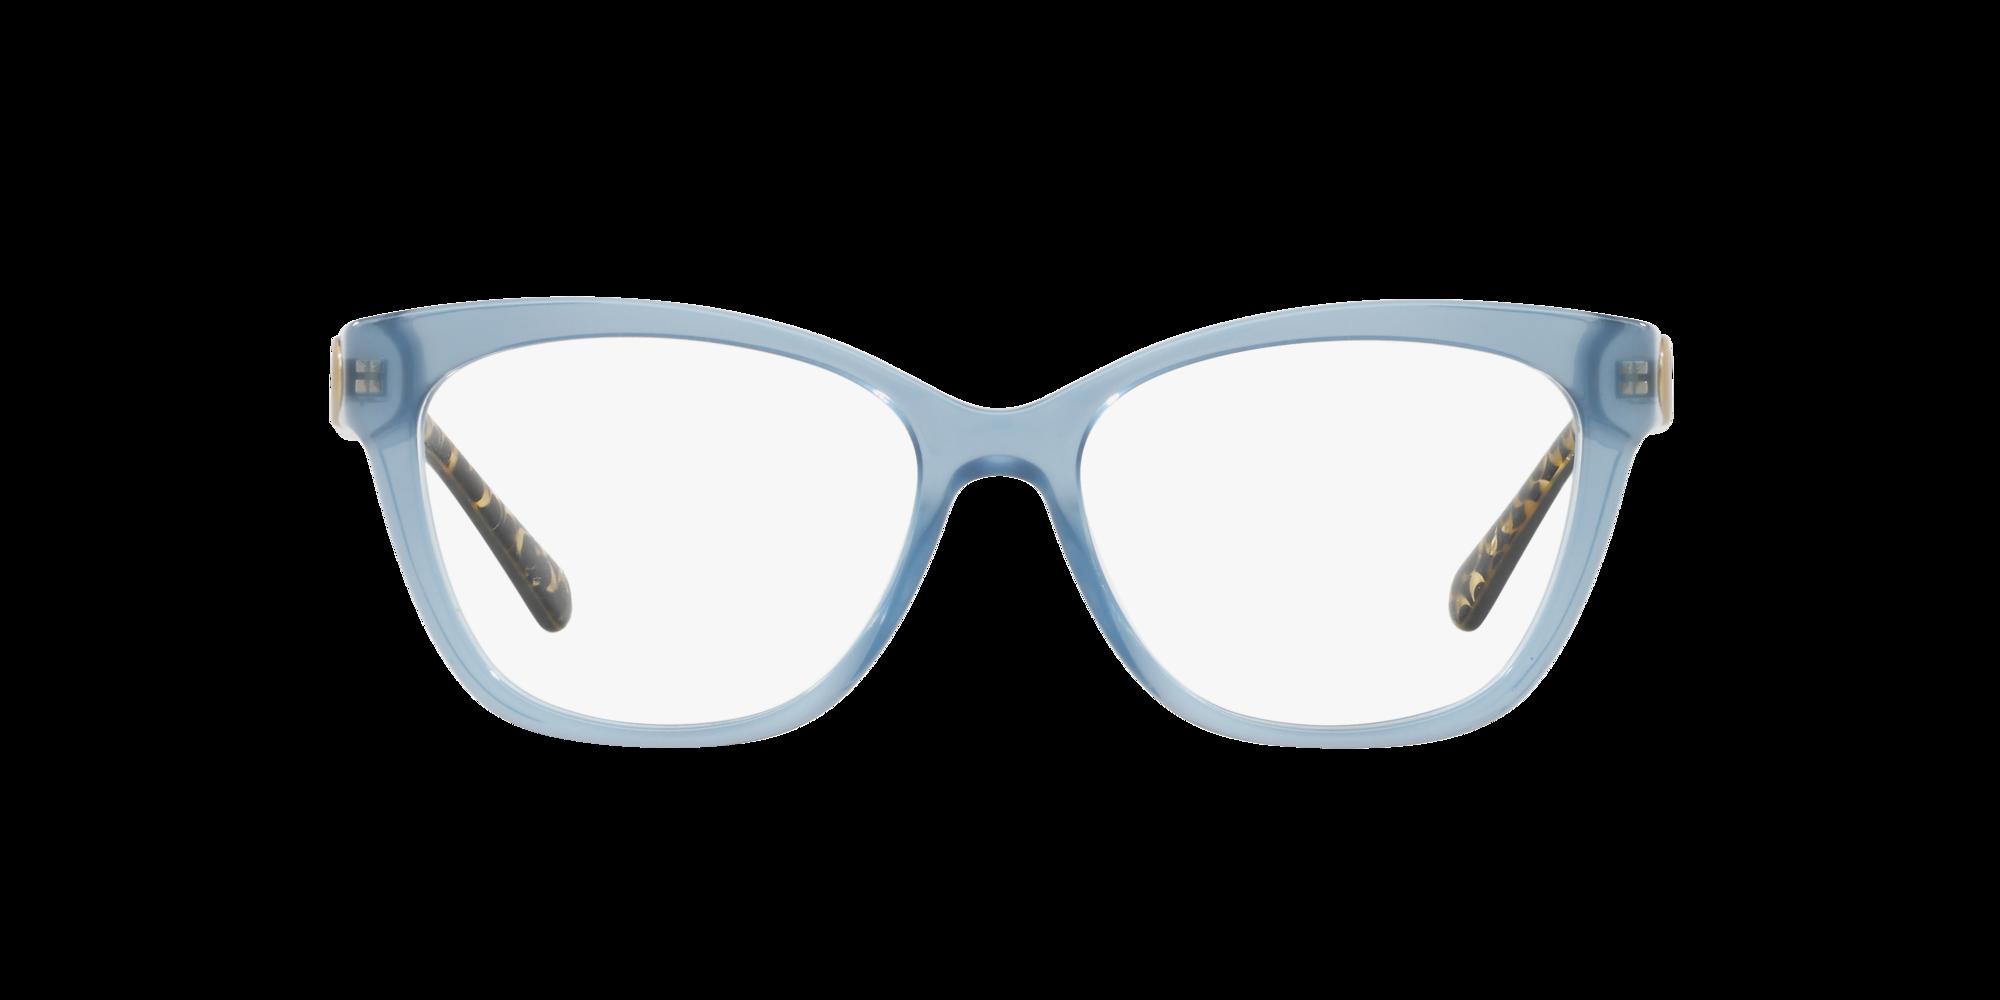 Image for HC6120 from LensCrafters | Glasses, Prescription Glasses Online, Eyewear